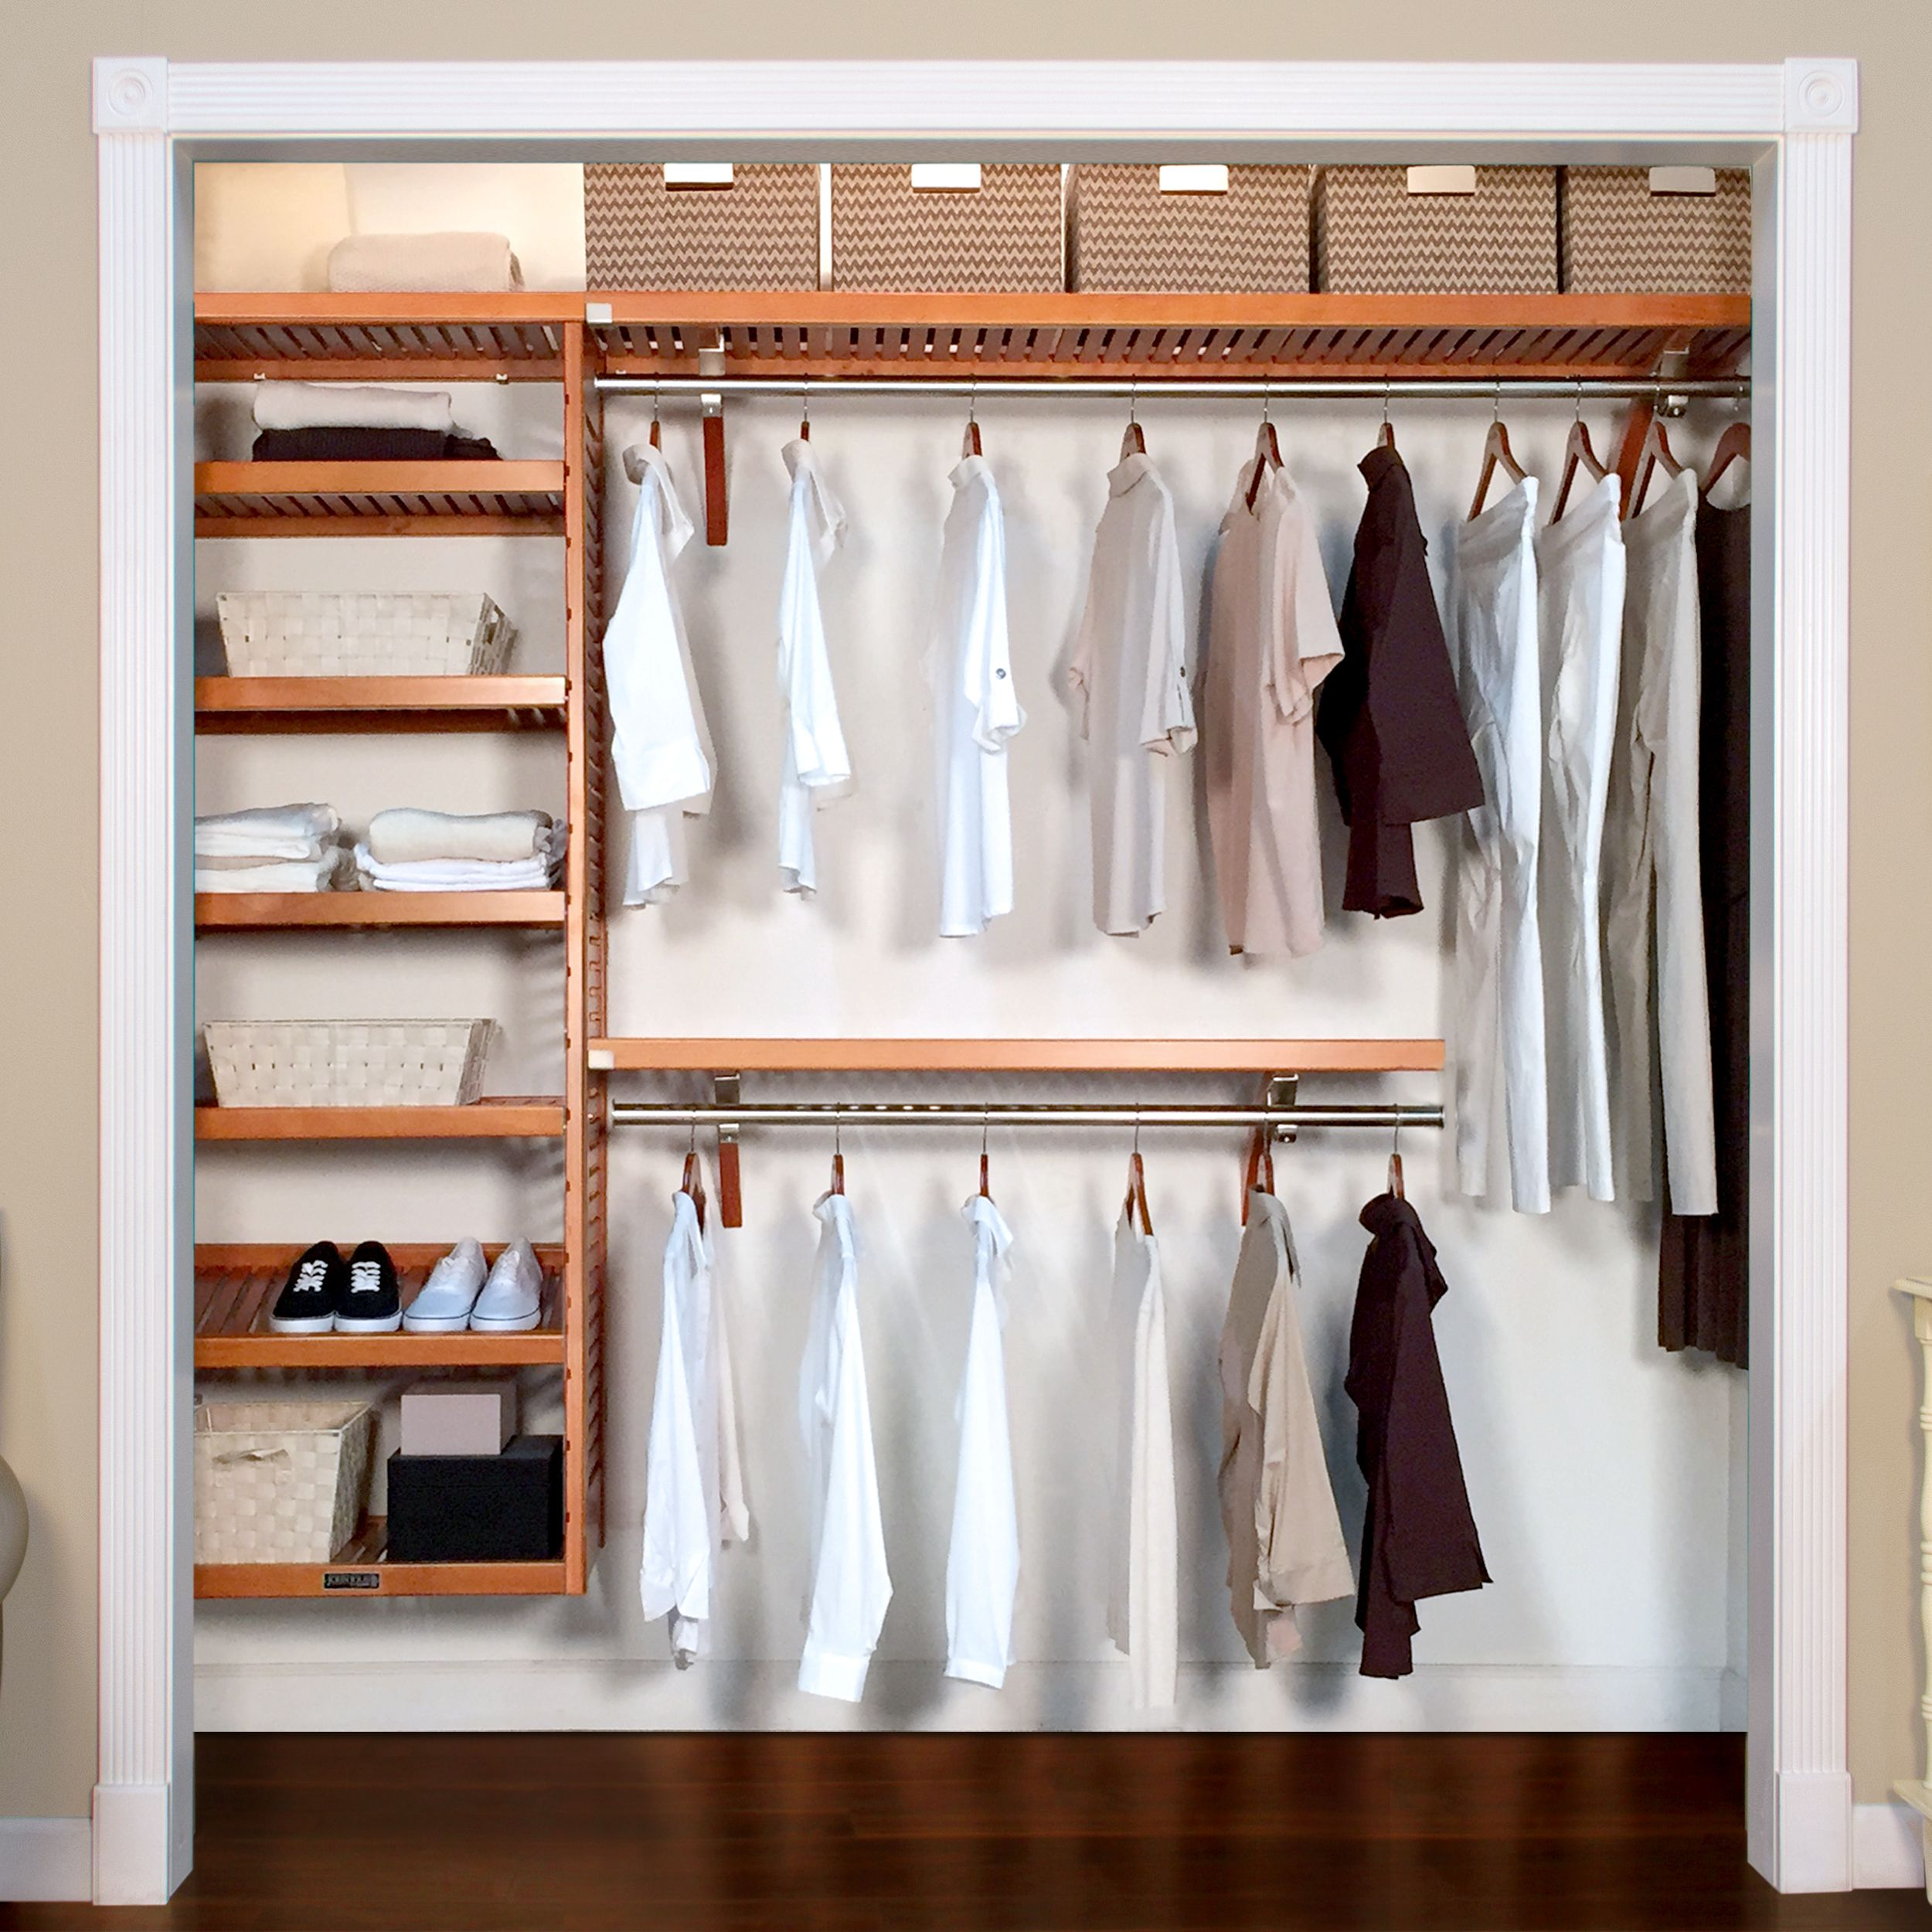 16in deep woodcrest deluxe organizer closet system